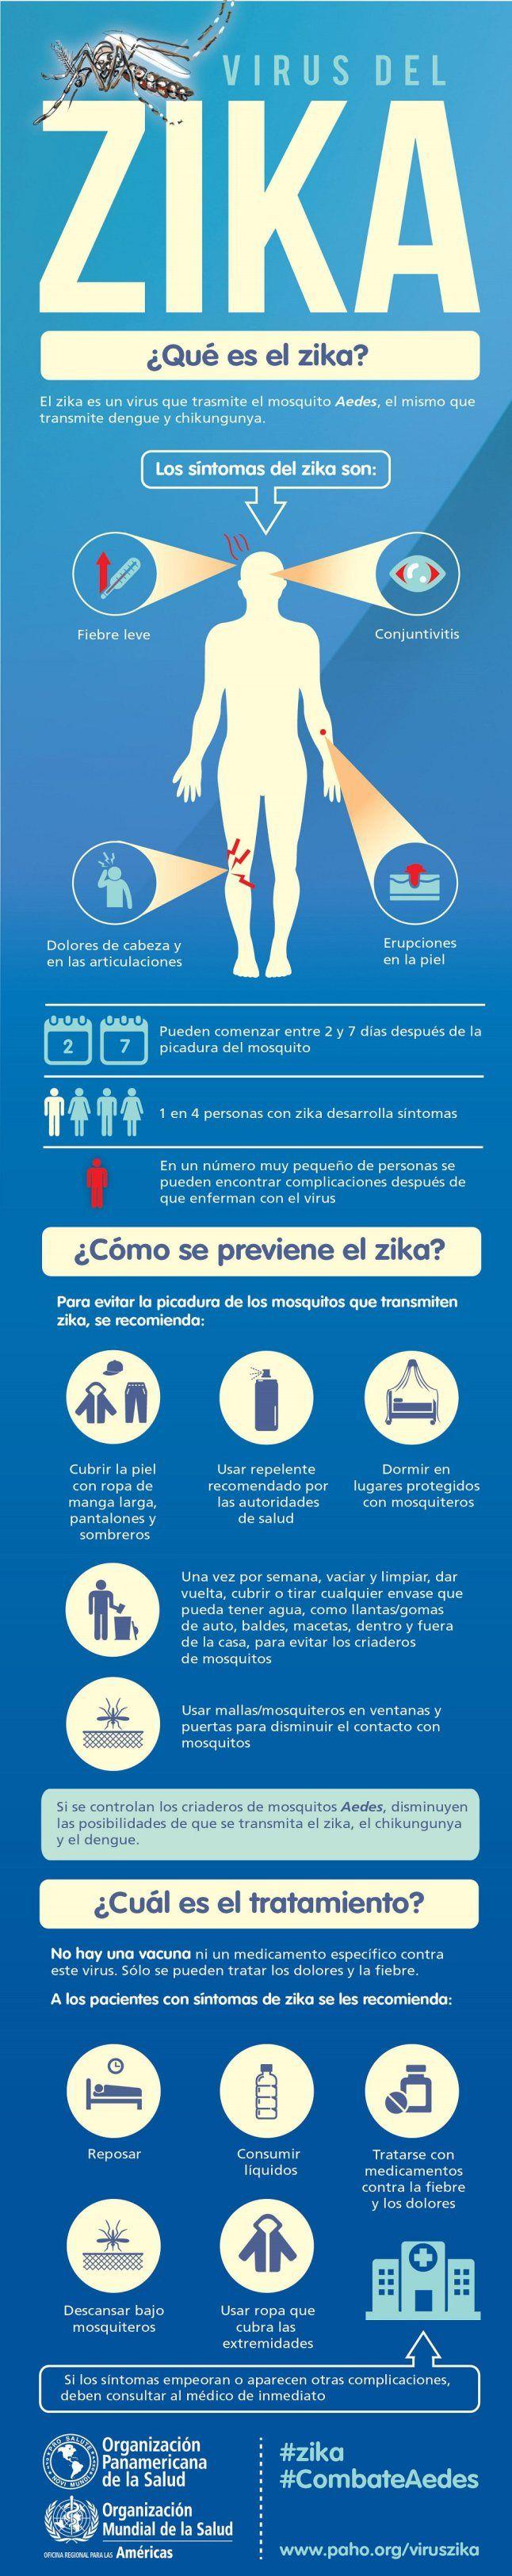 Virus del Zika #infografia #infographic #health